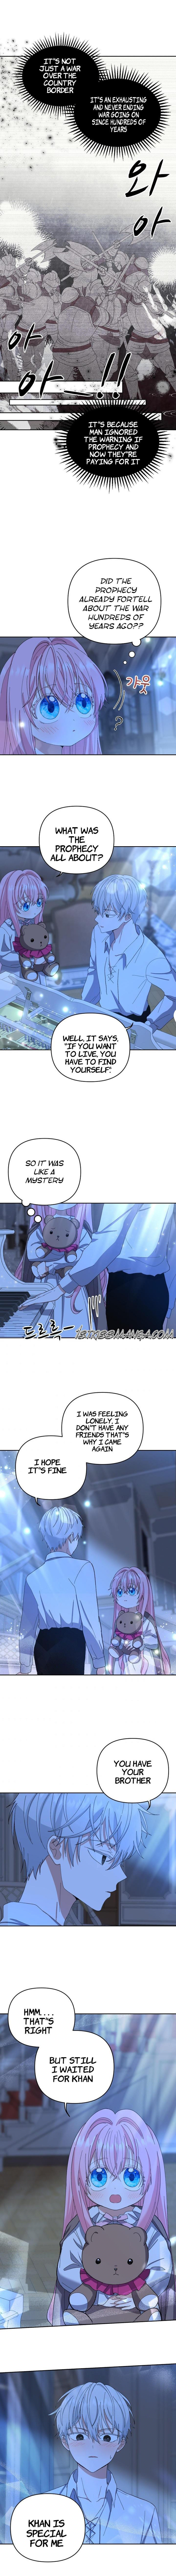 Baby Empress Chapter 23 page 3 - Mangakakalots.com